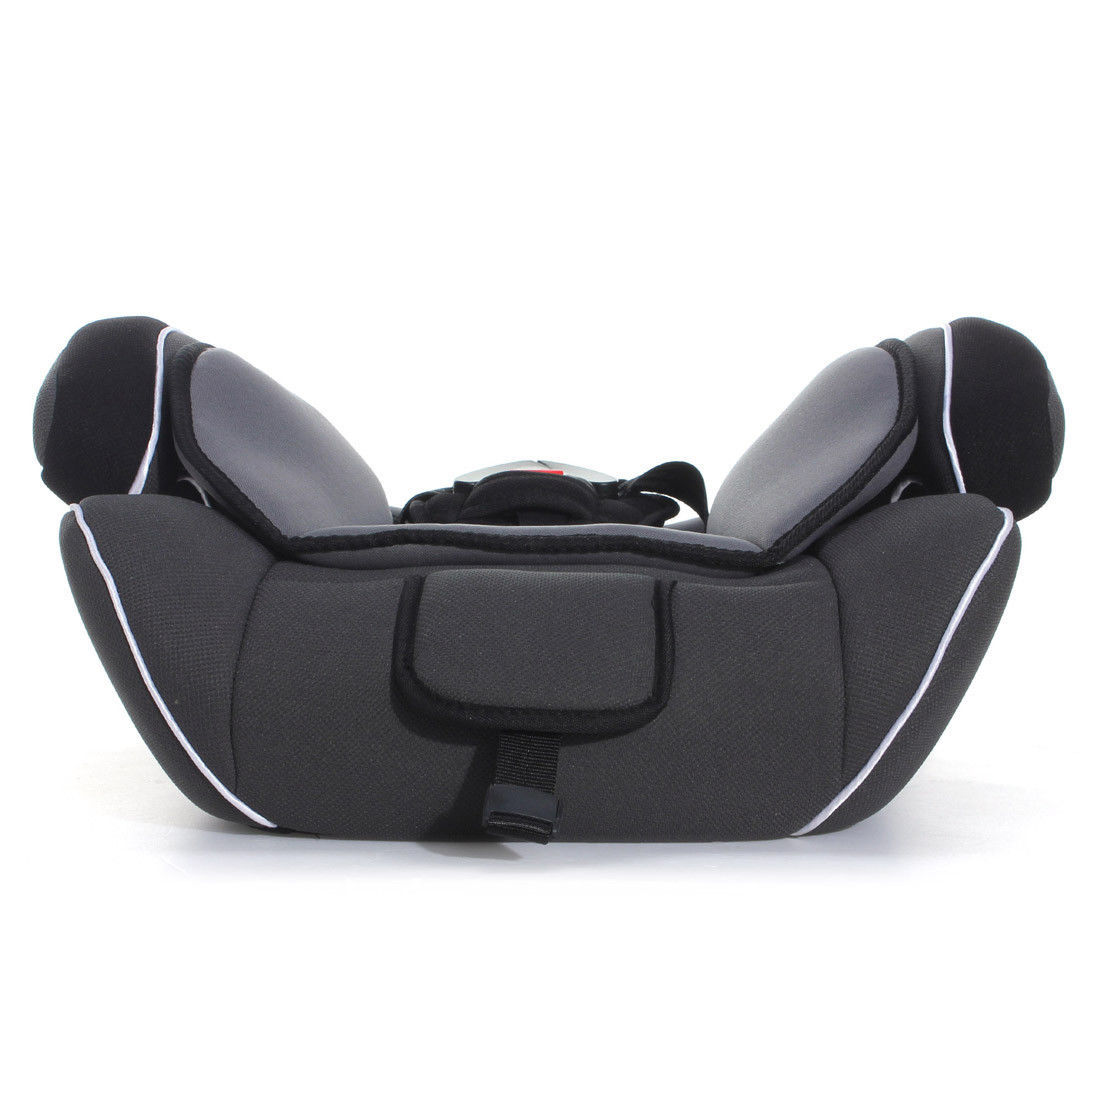 Black Toddler Baby Car Seat  Kid Children Convertible Safety Booster Seat